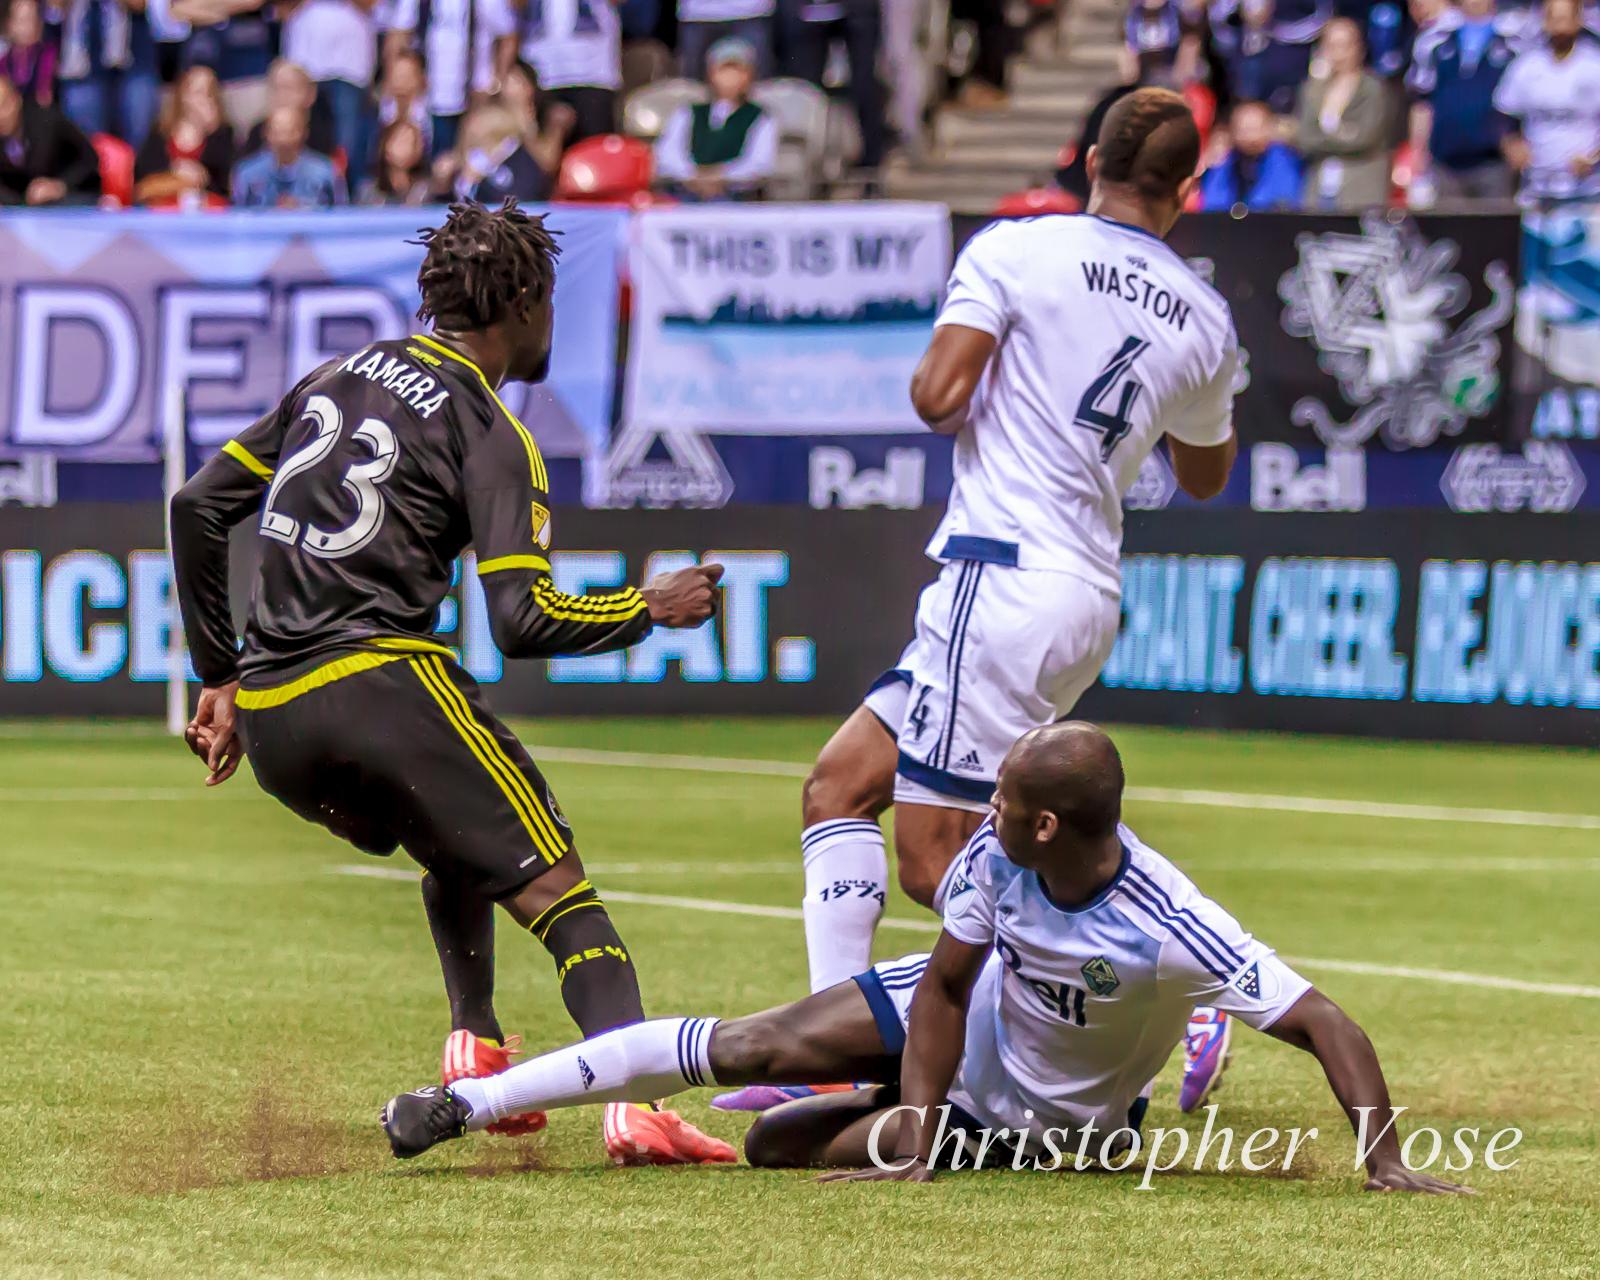 2015-04-08 Kei Kamara's First Goal.jpg